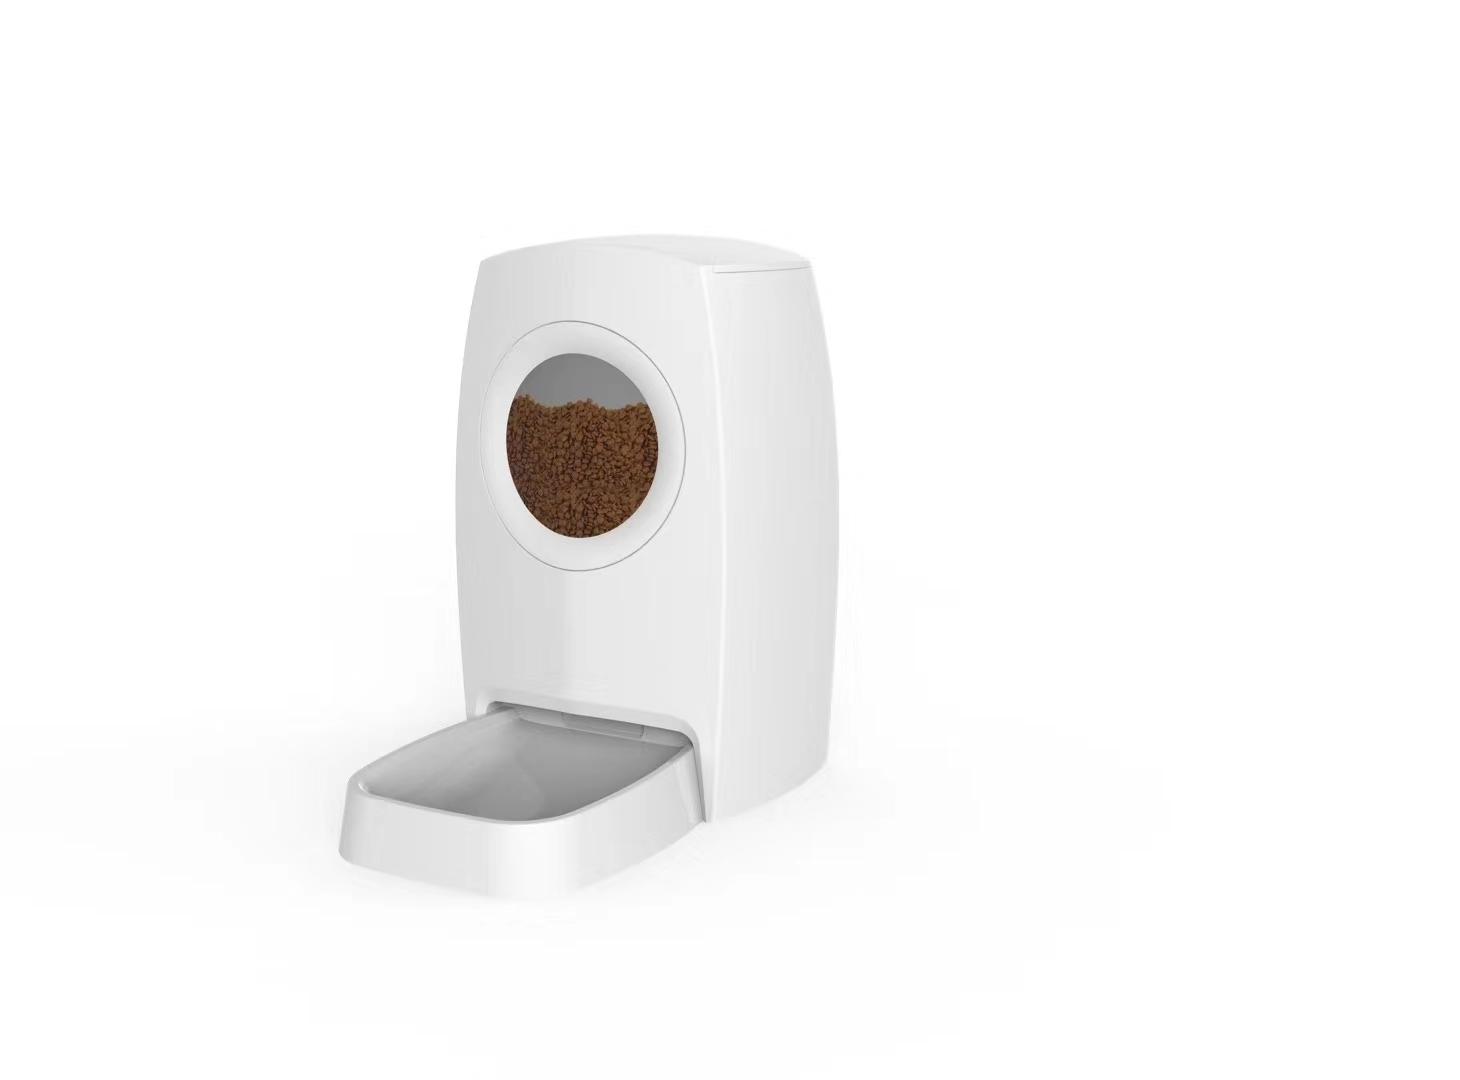 2020 Cozamo Timing Feeding with Visual Transparent Window Pet Feeder